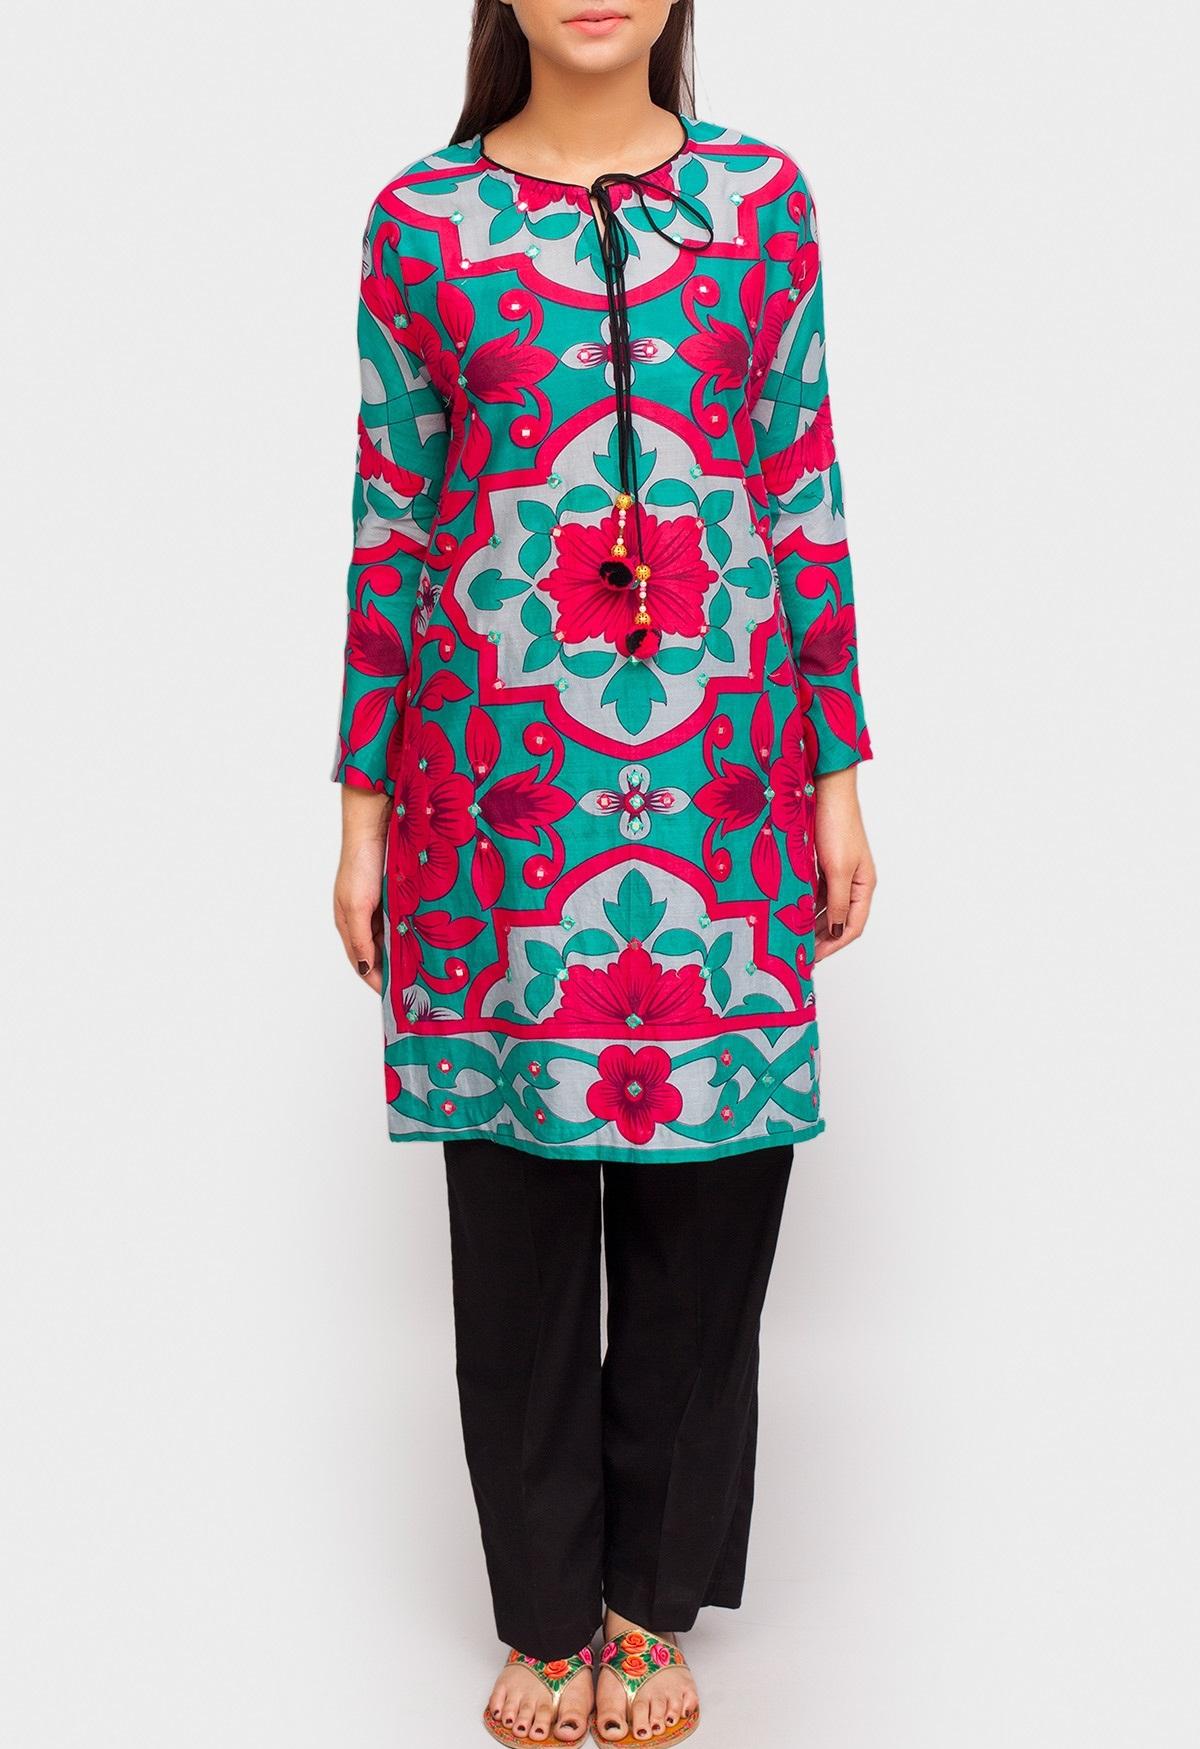 ferozi winter tunic with tassel details